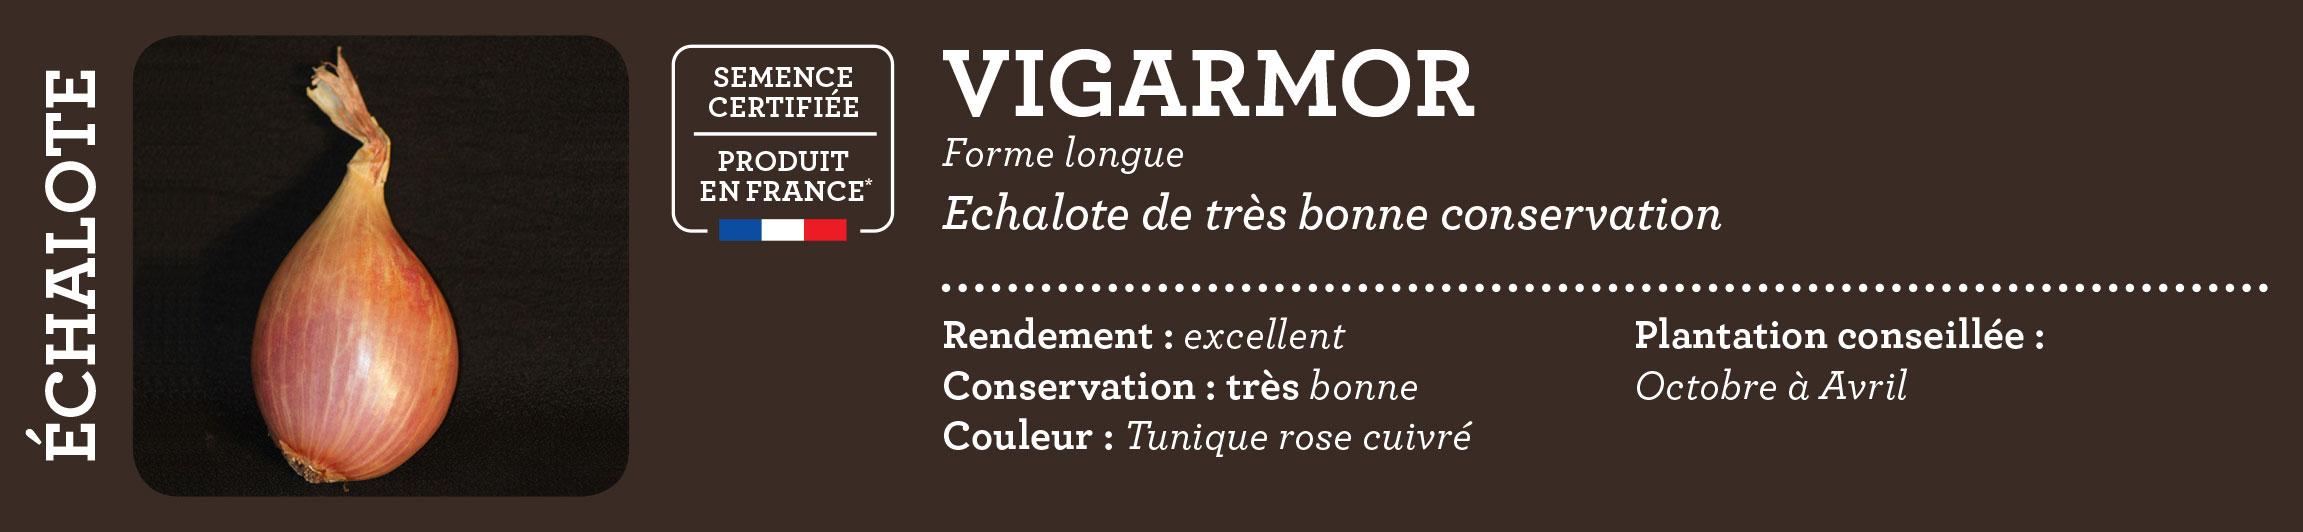 Carre de jardin bulbe potager etiquette vigarmor